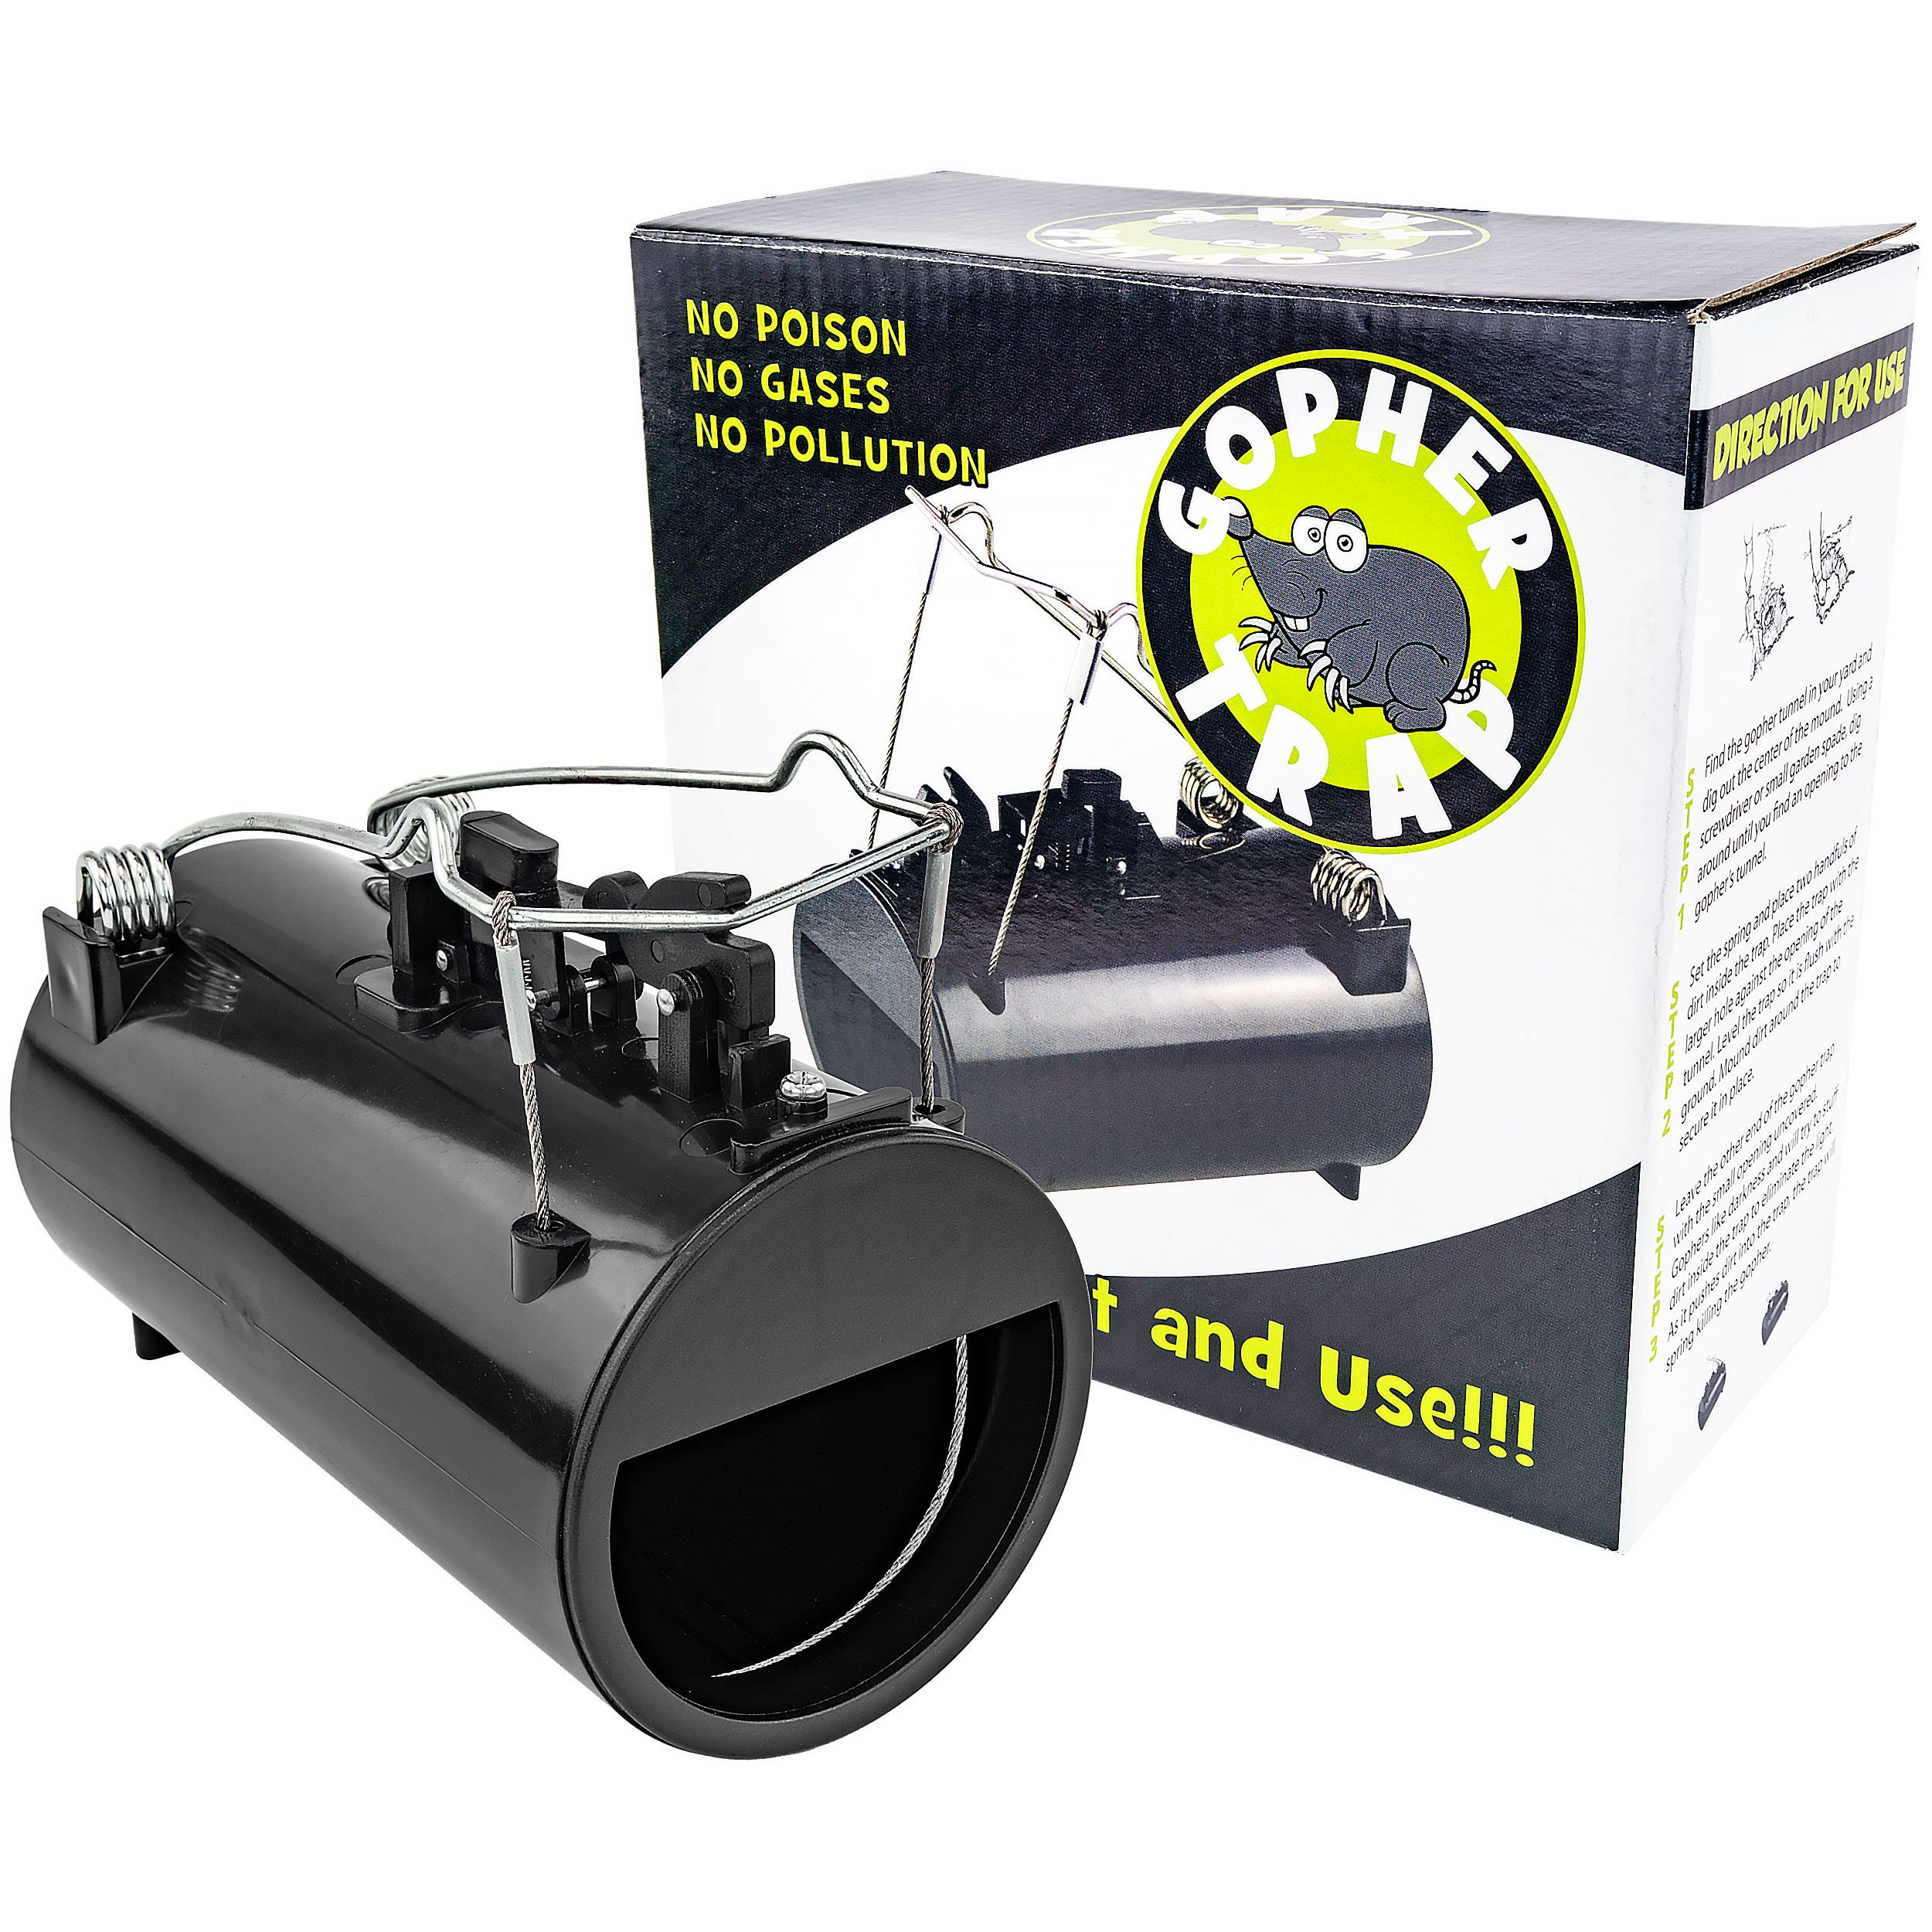 Southern Homewares SH-10165 Hole Gopher/Rodent Easy Set Spring Loaded Trap, Black